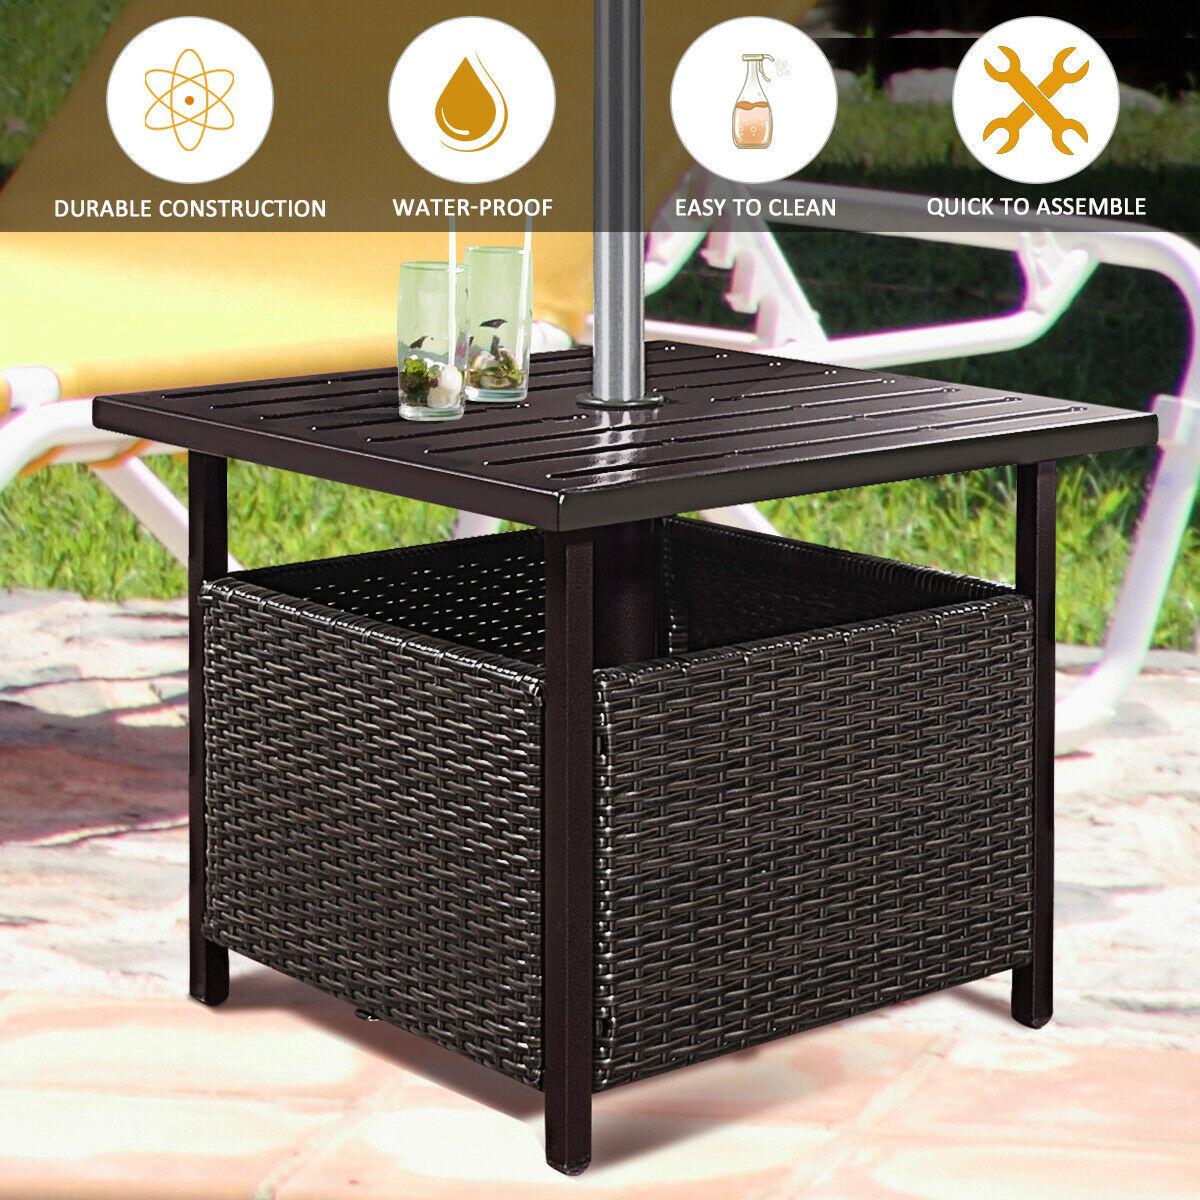 Details about  /Brown Ratan Wicker Steel Side Table Outdoor Umbrella Hole Deck Garden Patio Pool